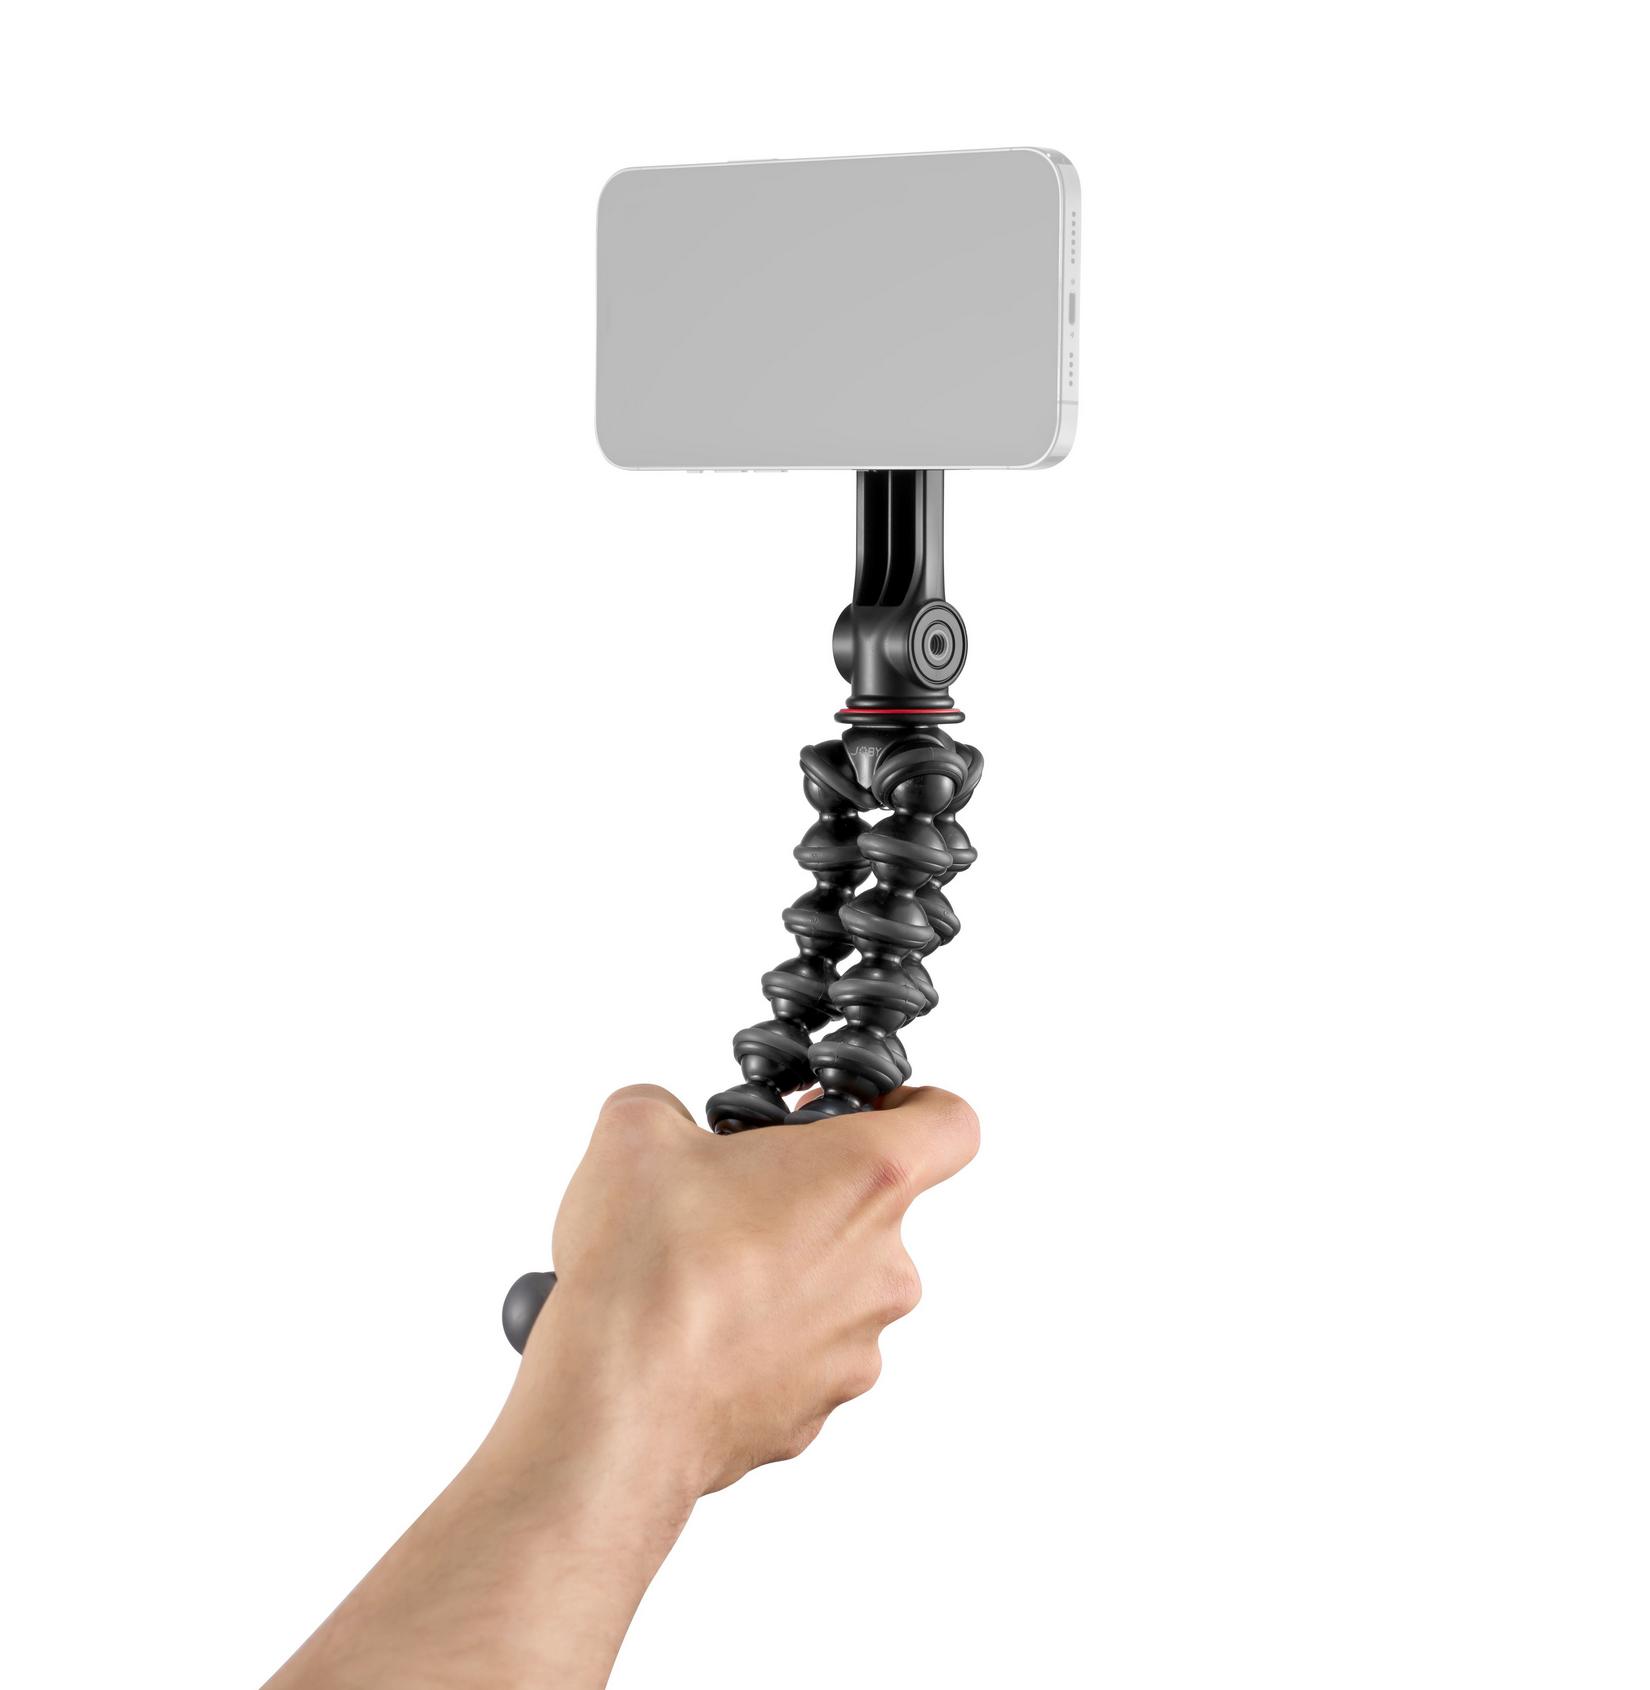 Joby GripTight MagSafe Kit